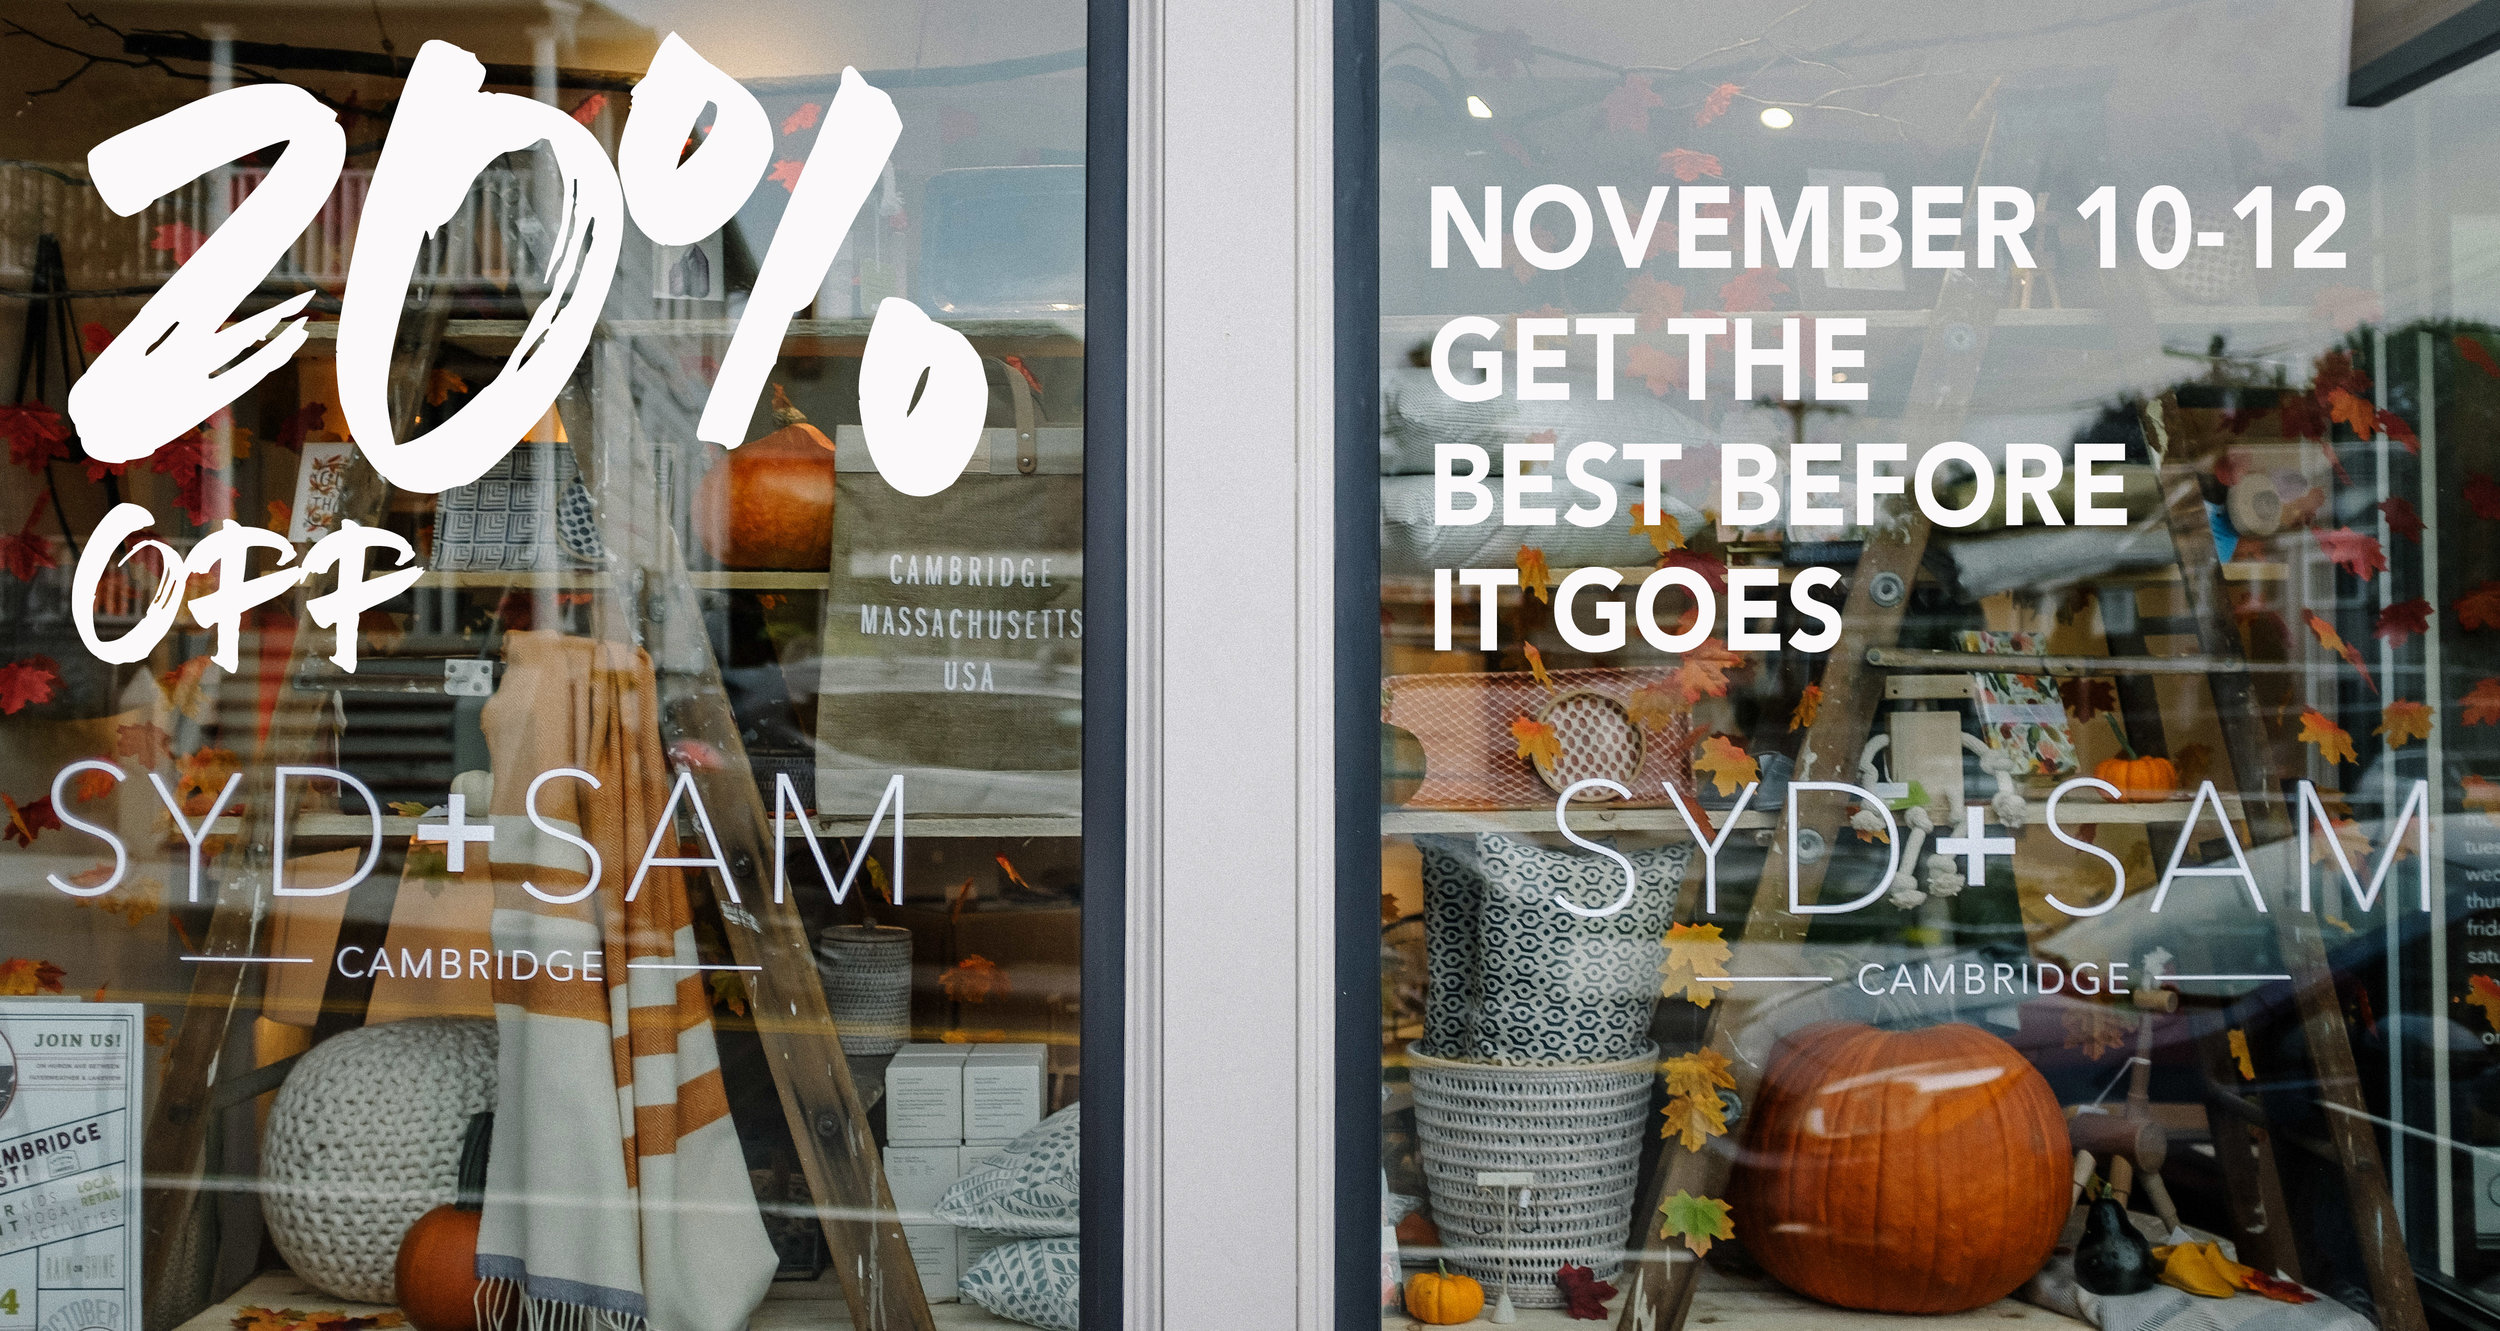 vets weekend sale window.jpg